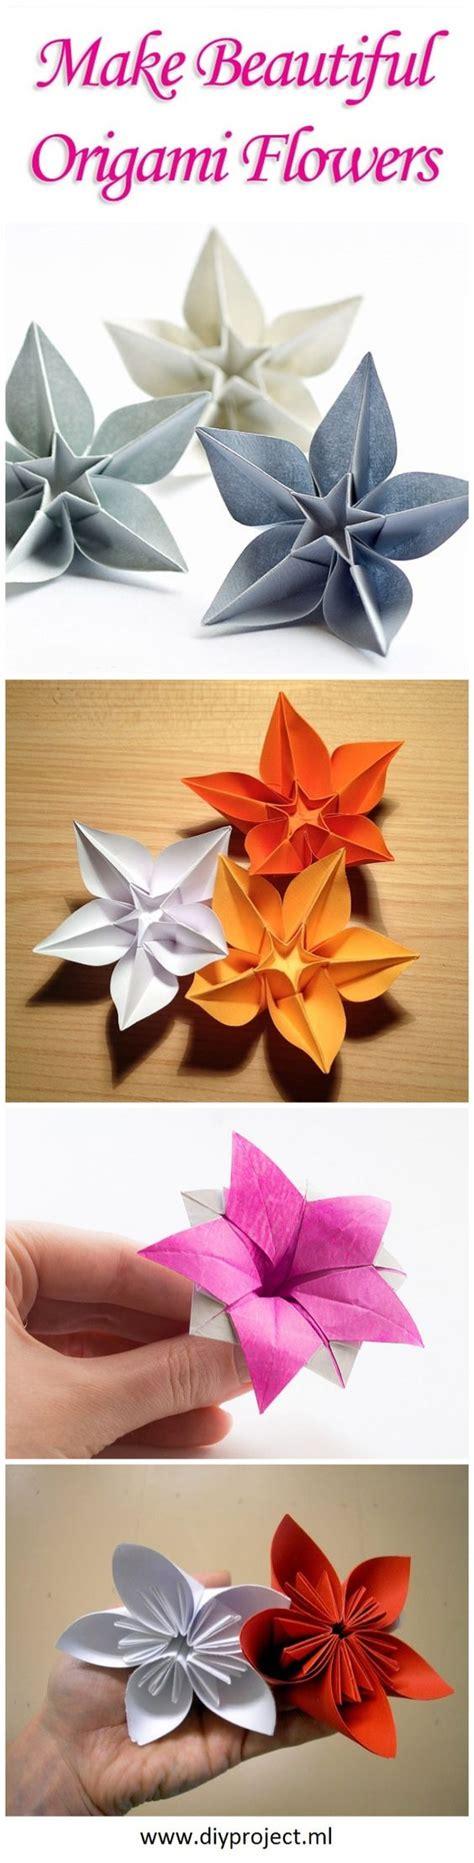 Single Sheet Origami Flower - fleurs en origami origami and fleur on